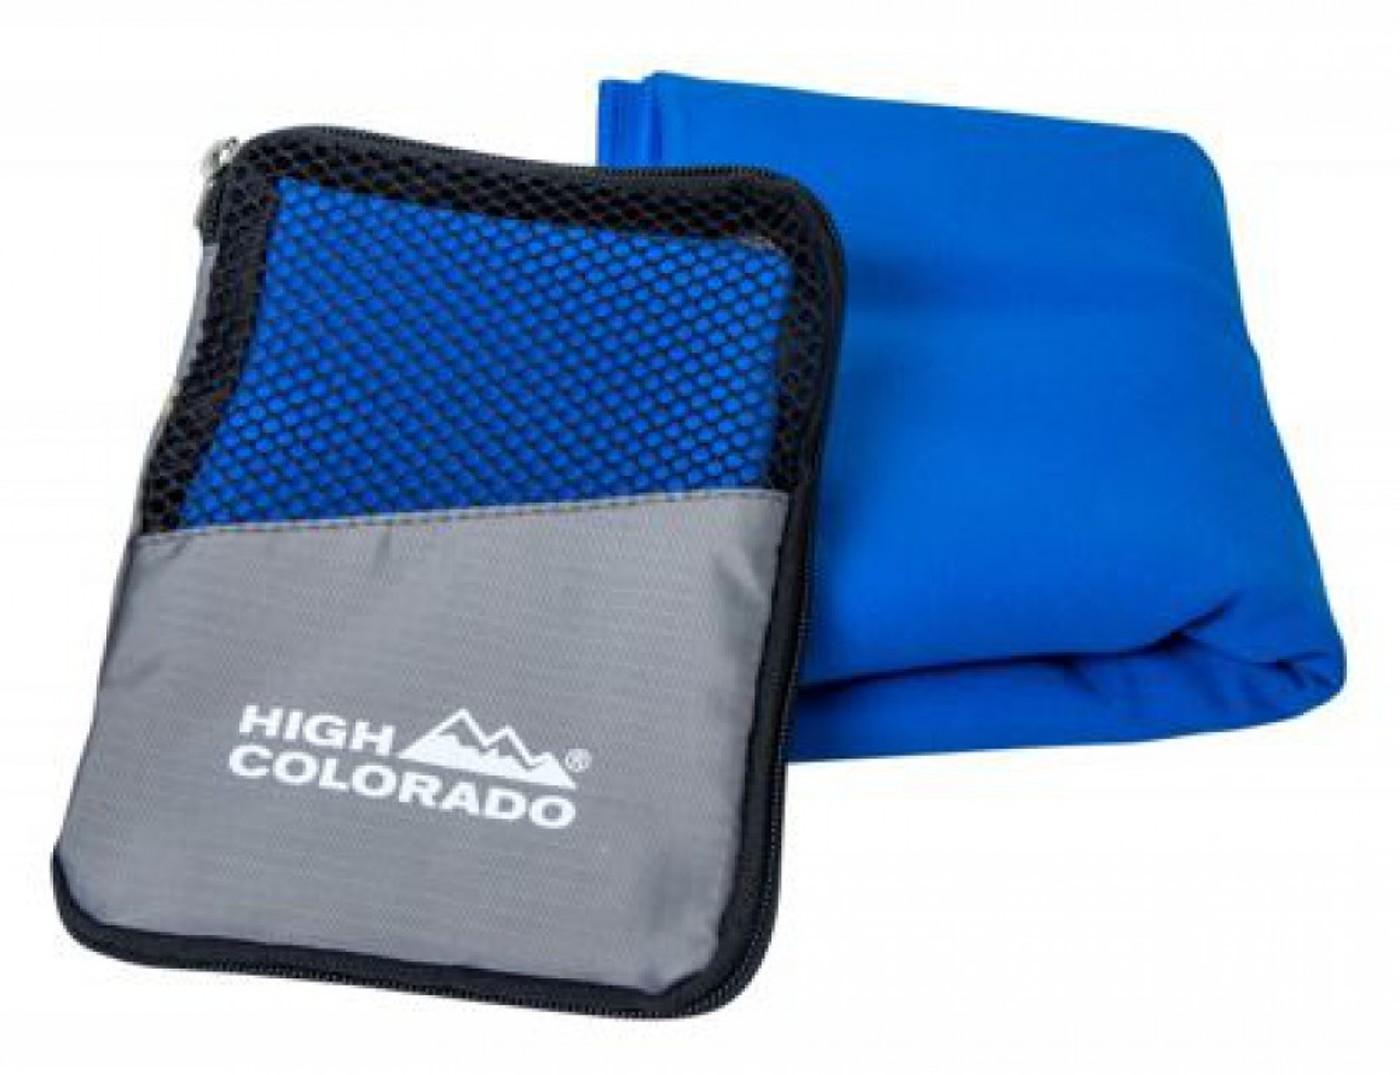 HIGH COLORADO TRAVEL TOWEL